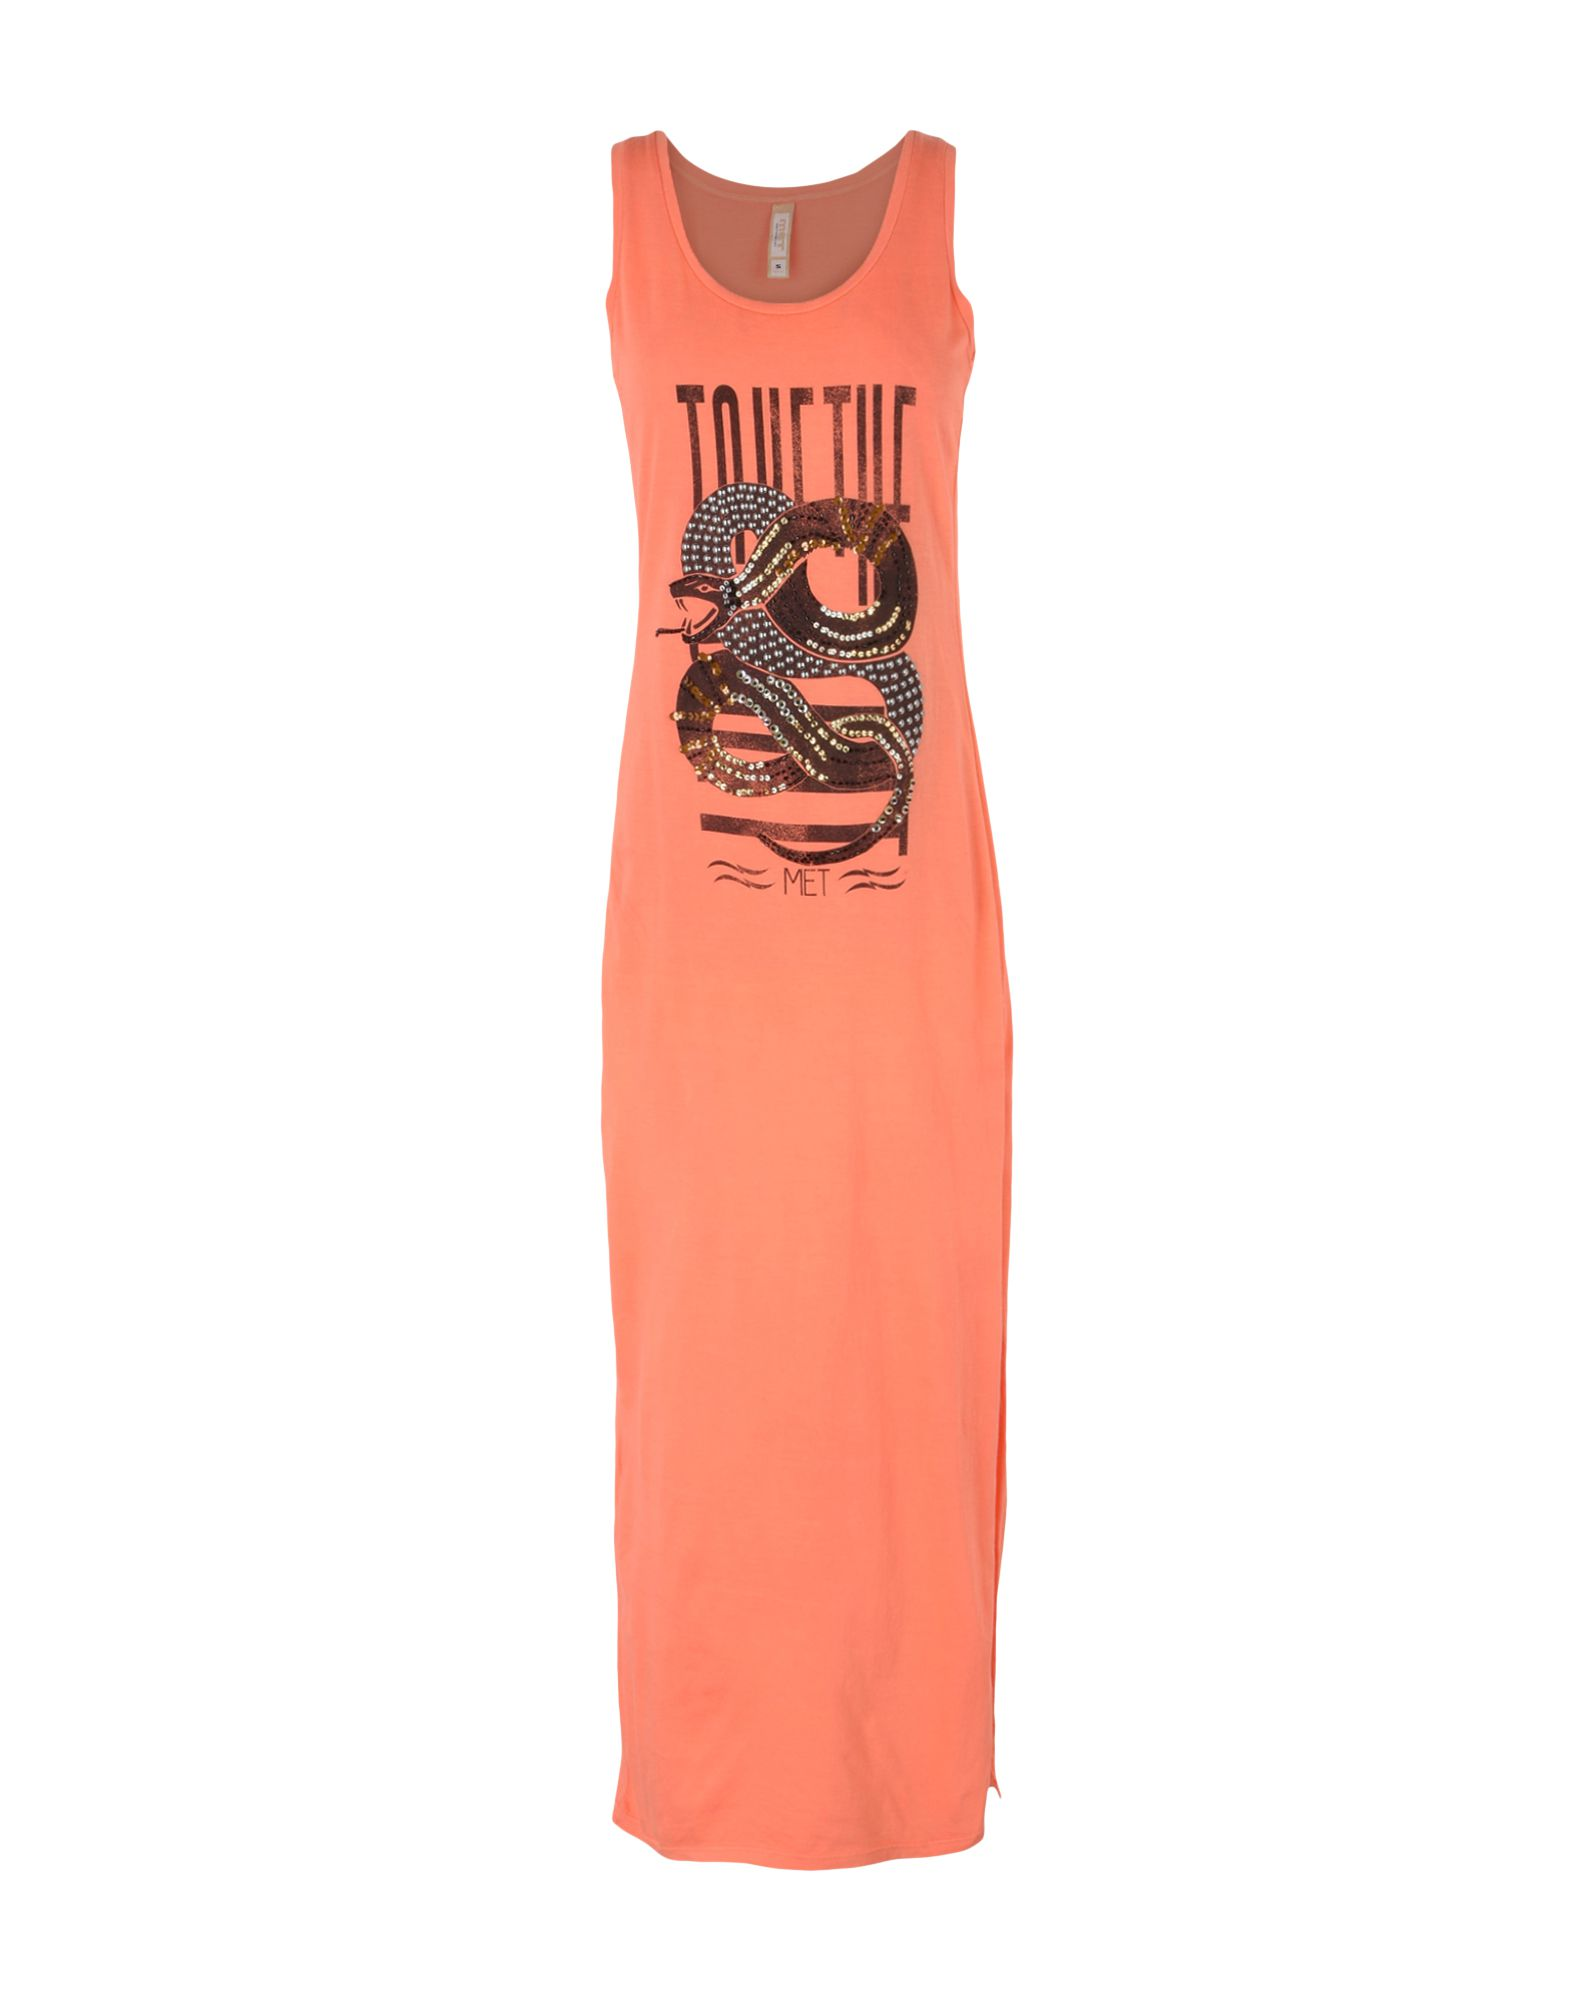 MET Платье длиной 3/4 lisa corti платье длиной 3 4